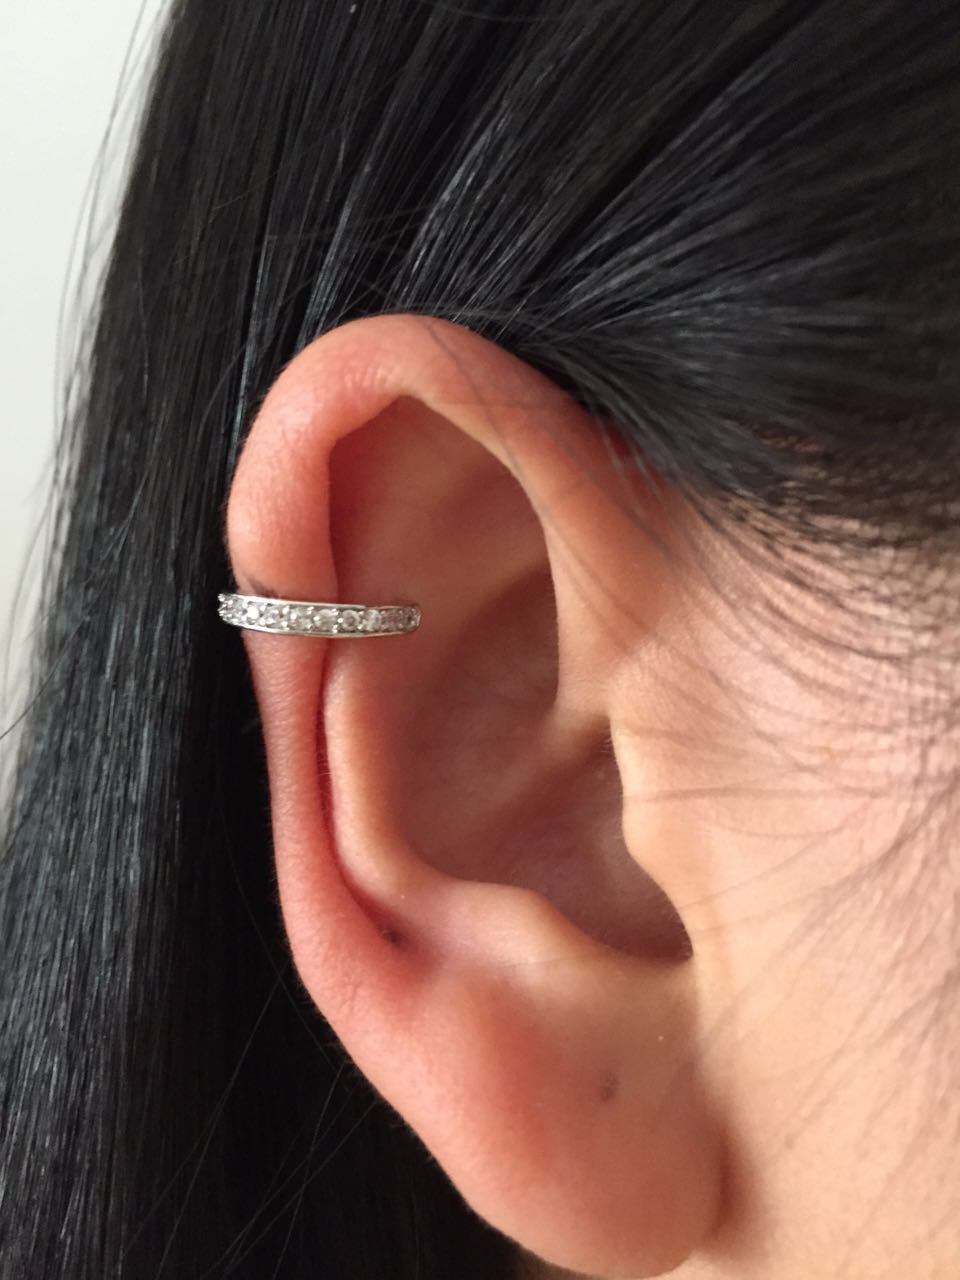 Brinco האוזן השרוול האוזן קליפ Zirconia עגילי תכשיטים באוזן אחת עבור נשים אופנה Earing תכשיטים האוזן הימנית רק אביזרים ליידי